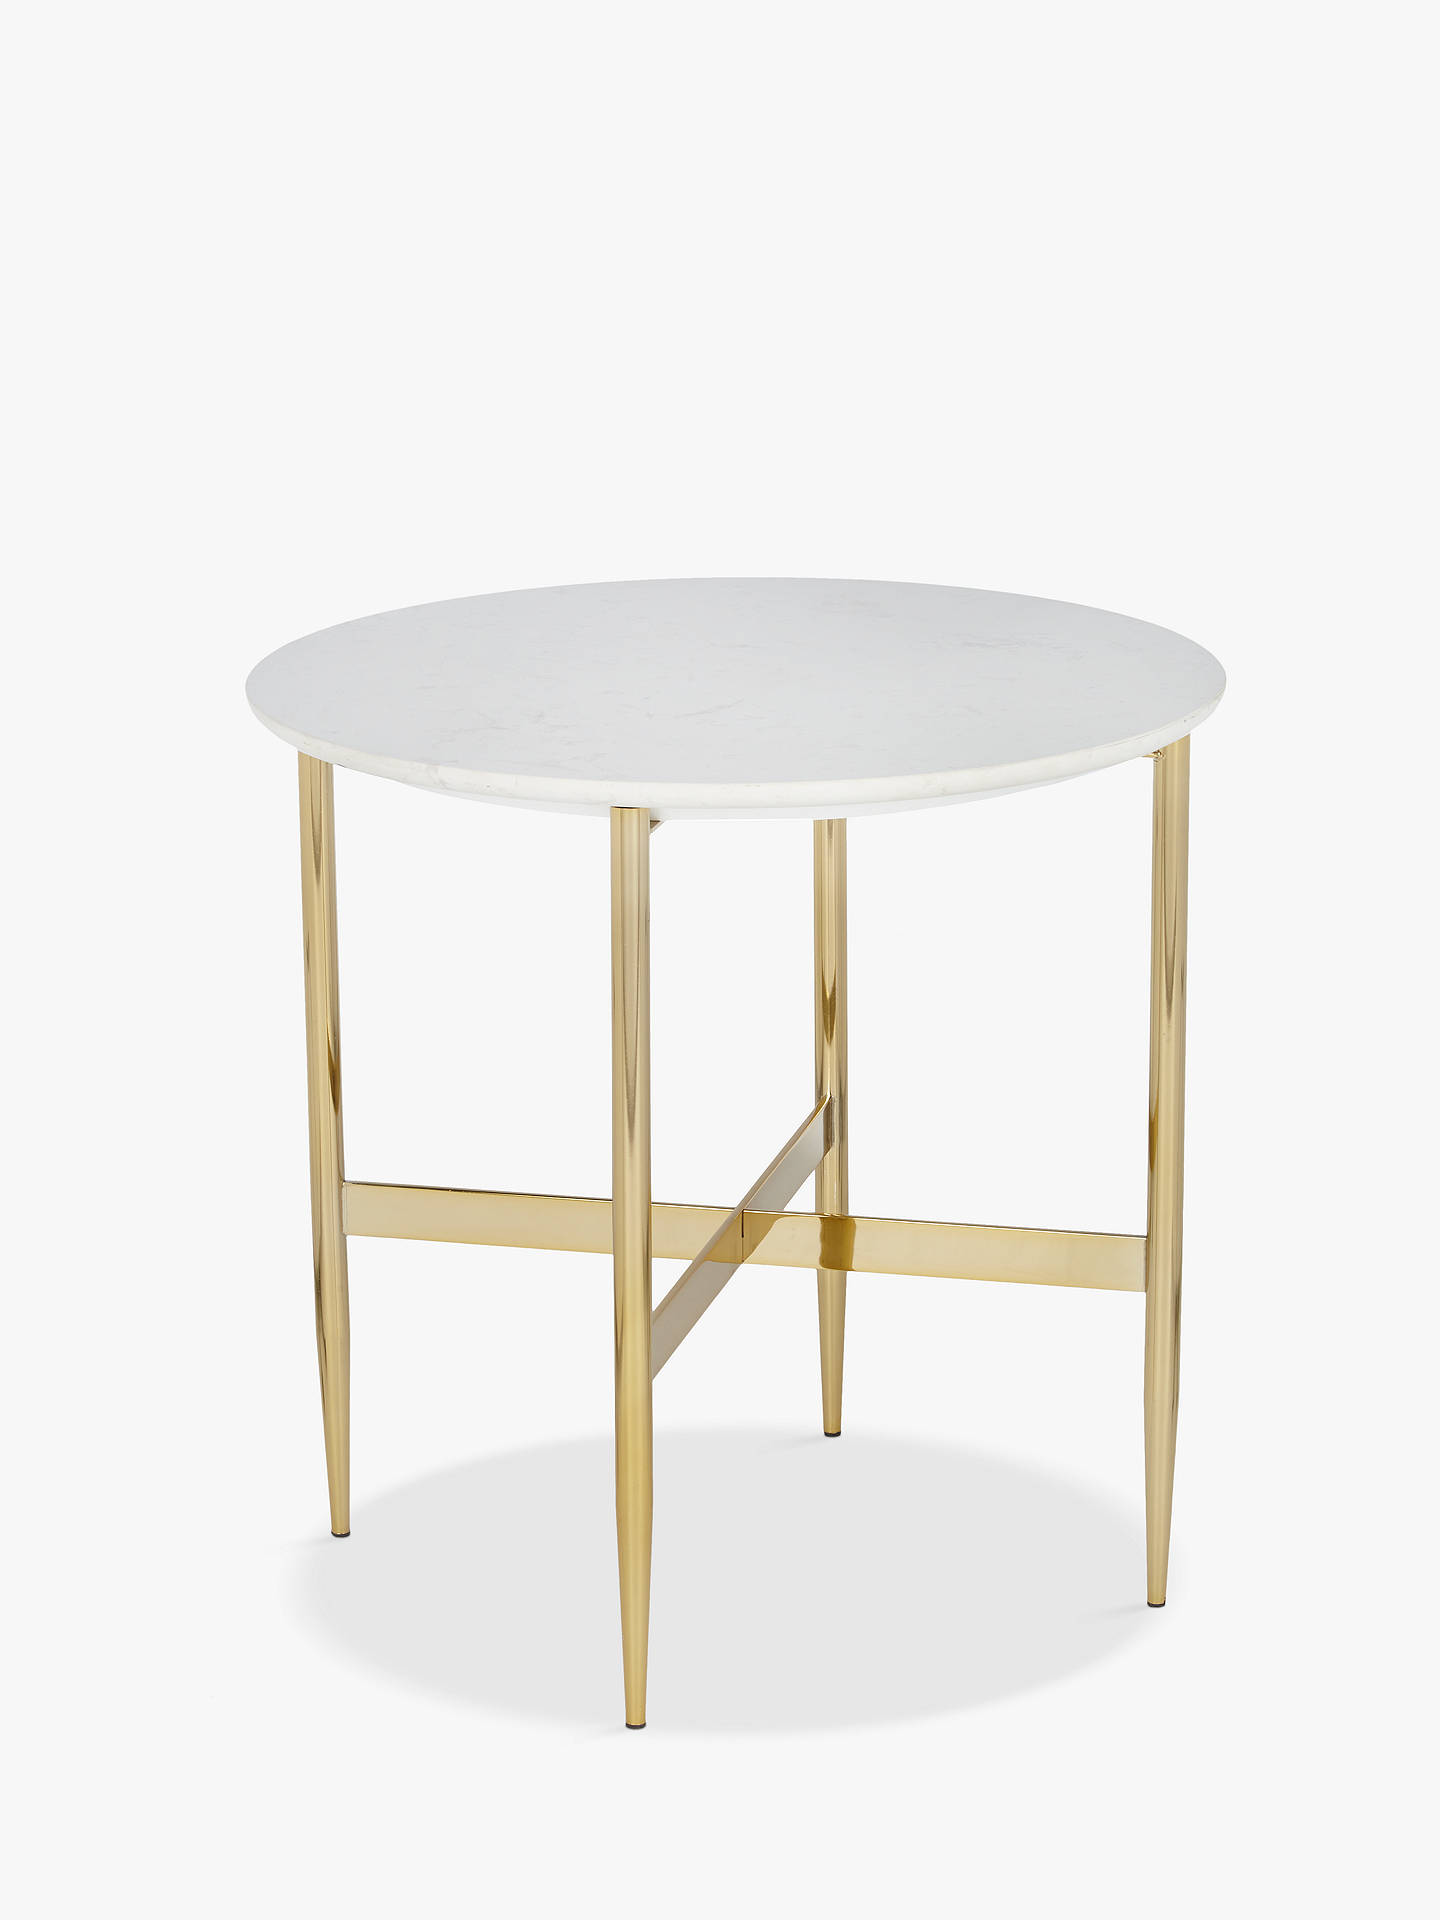 john lewis partners riya side table at john lewis partners. Black Bedroom Furniture Sets. Home Design Ideas